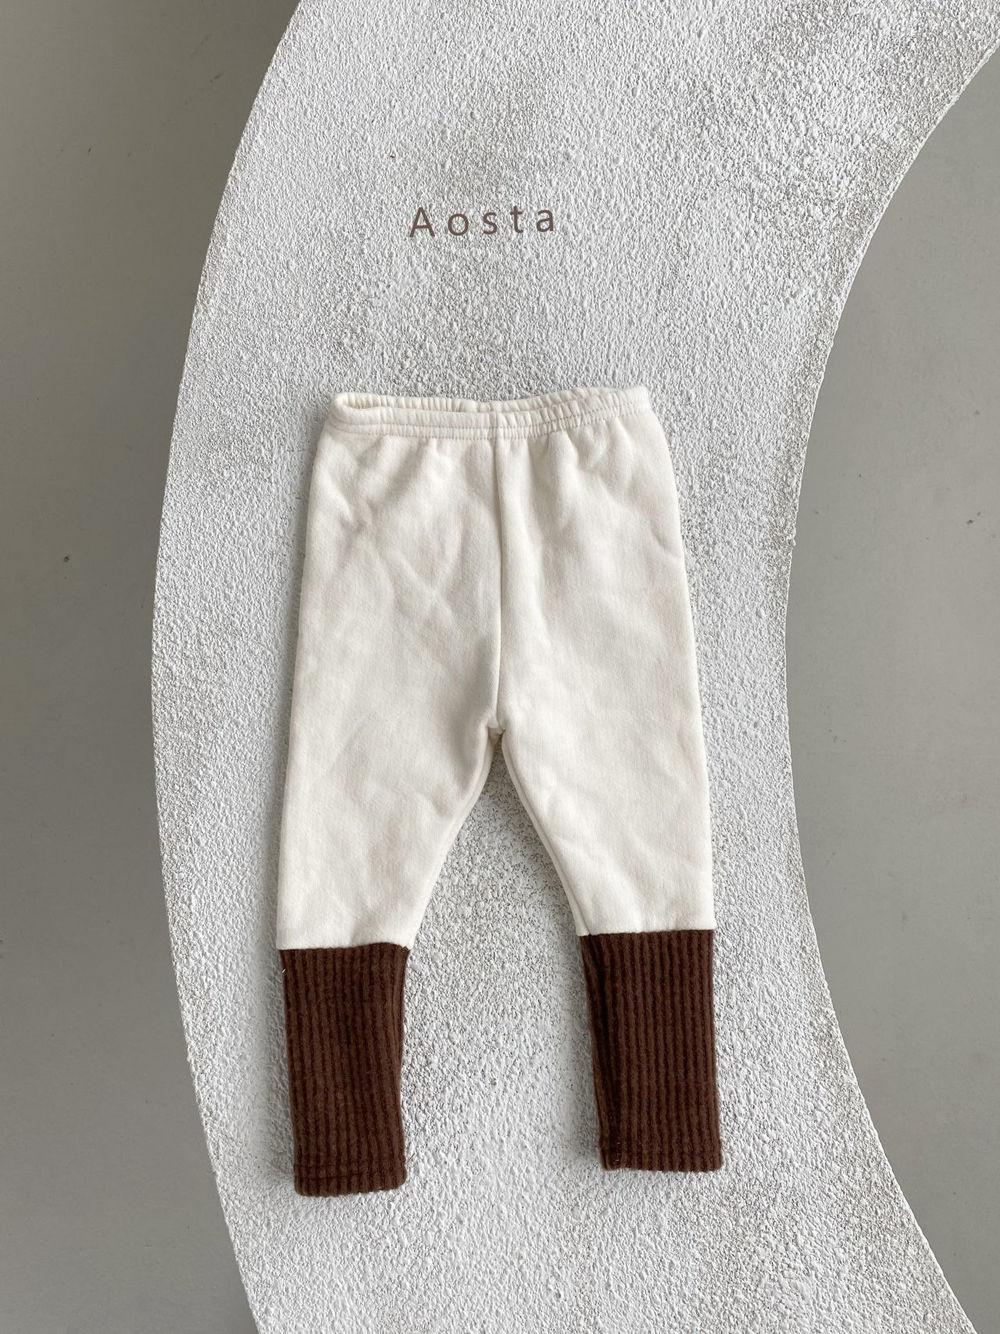 AOSTA - Korean Children Fashion - #Kfashion4kids - Warmer Leggings - 3